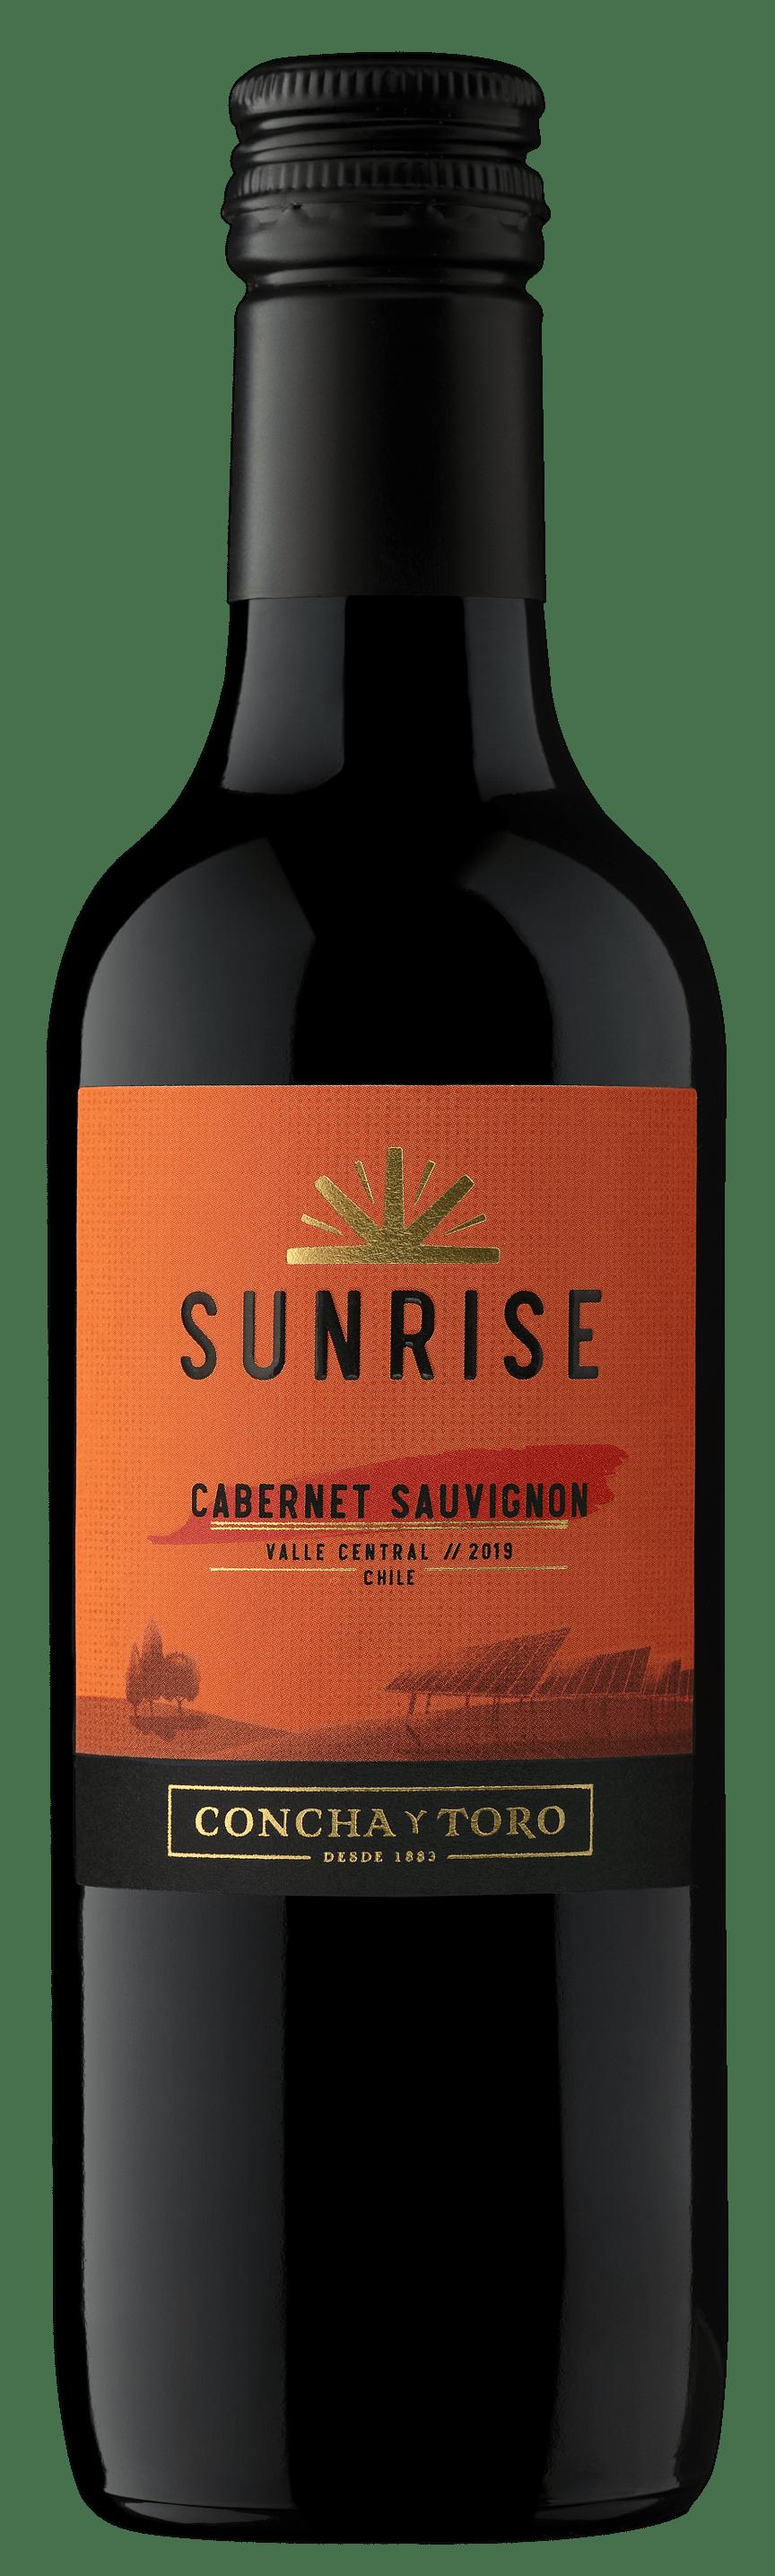 Sunrise Cabernet Sauvignon, 16676-04